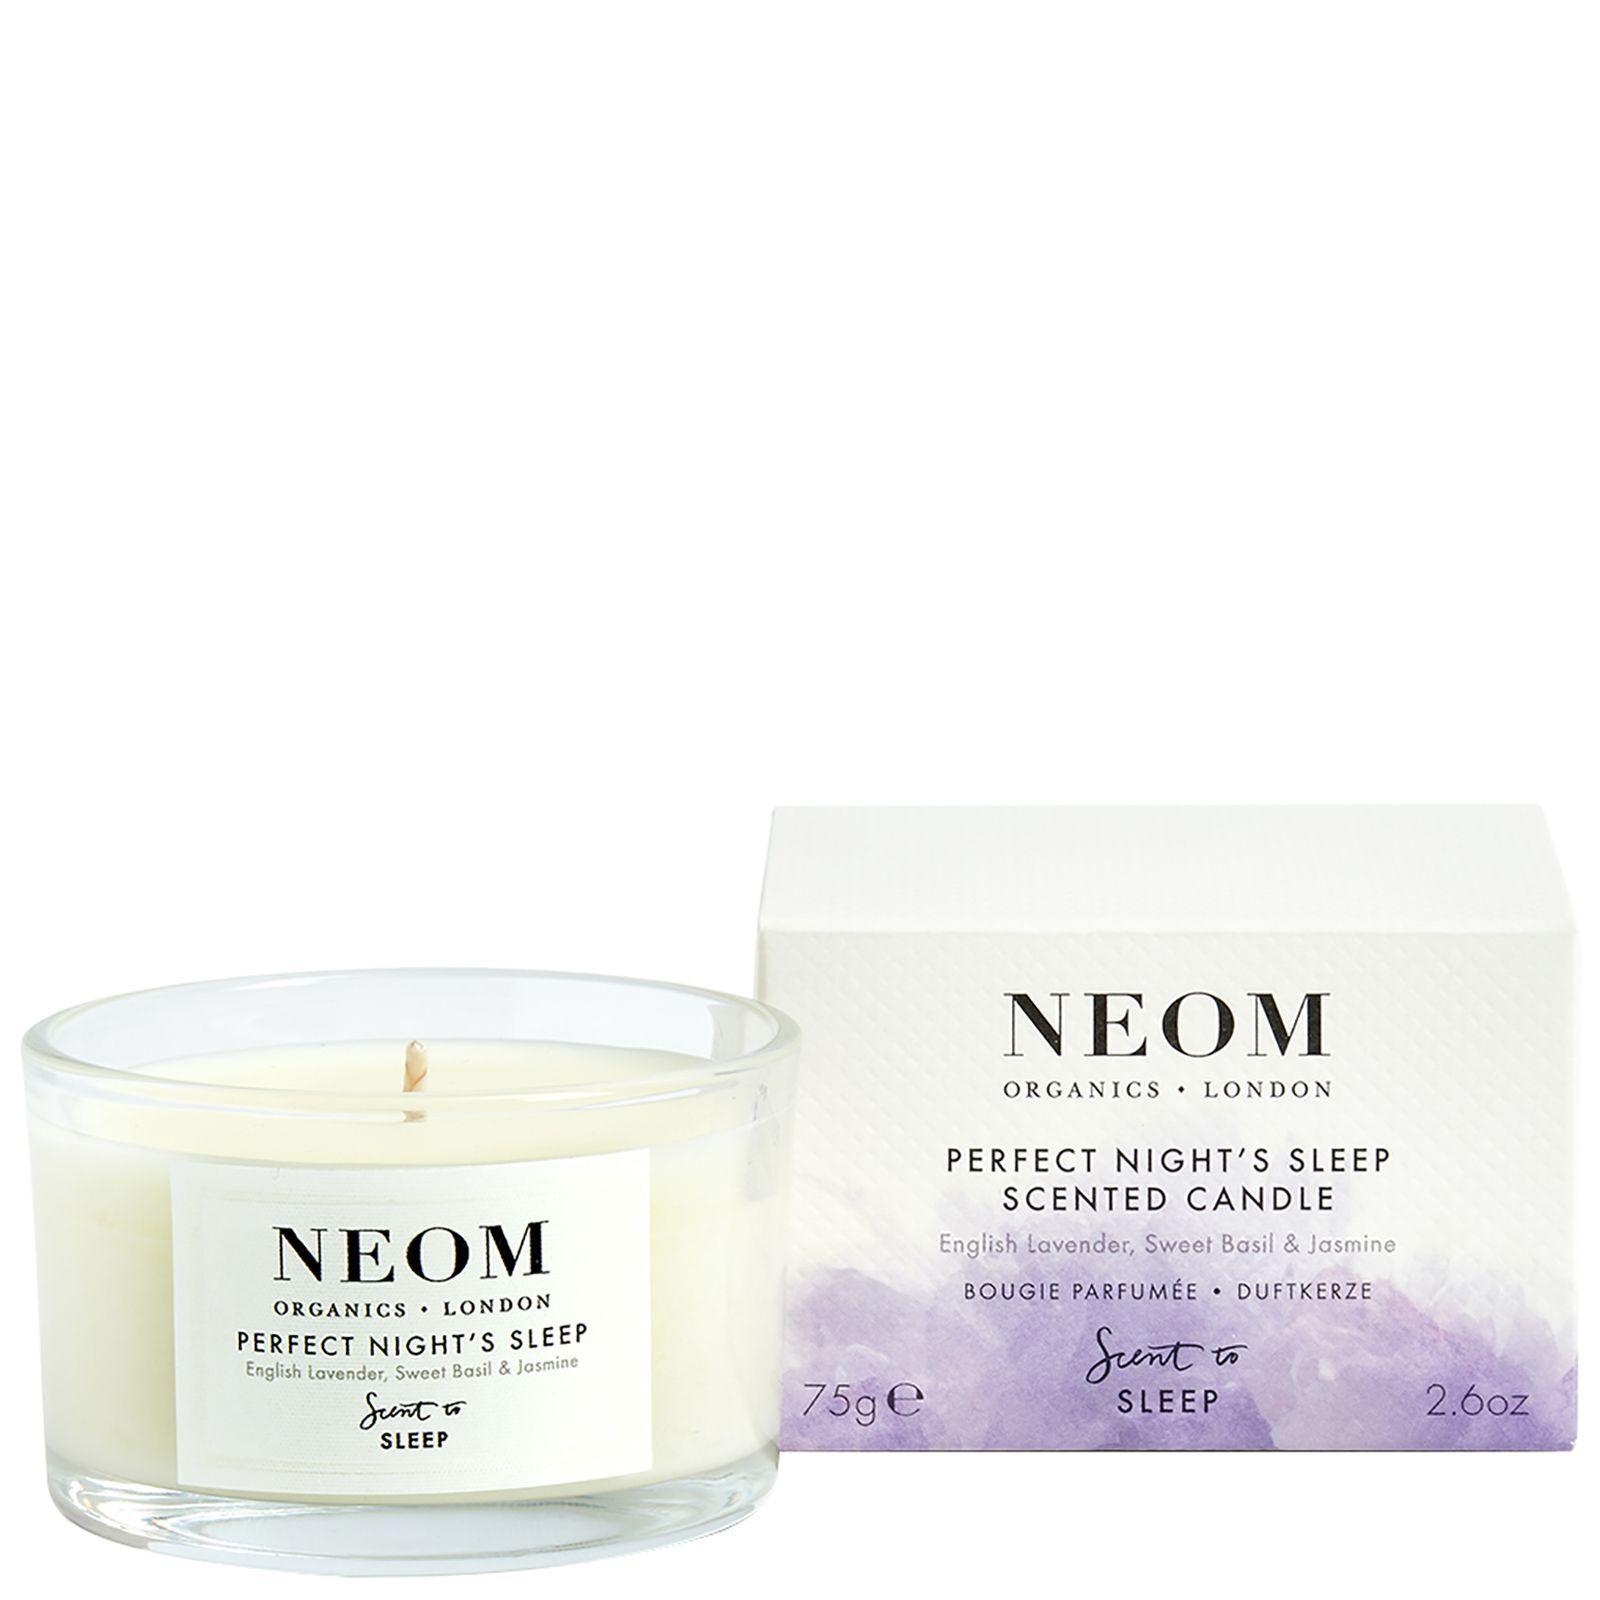 Neom Organics London Scent To Sleep Candela profumata con tranquillità (viaggio) 75g